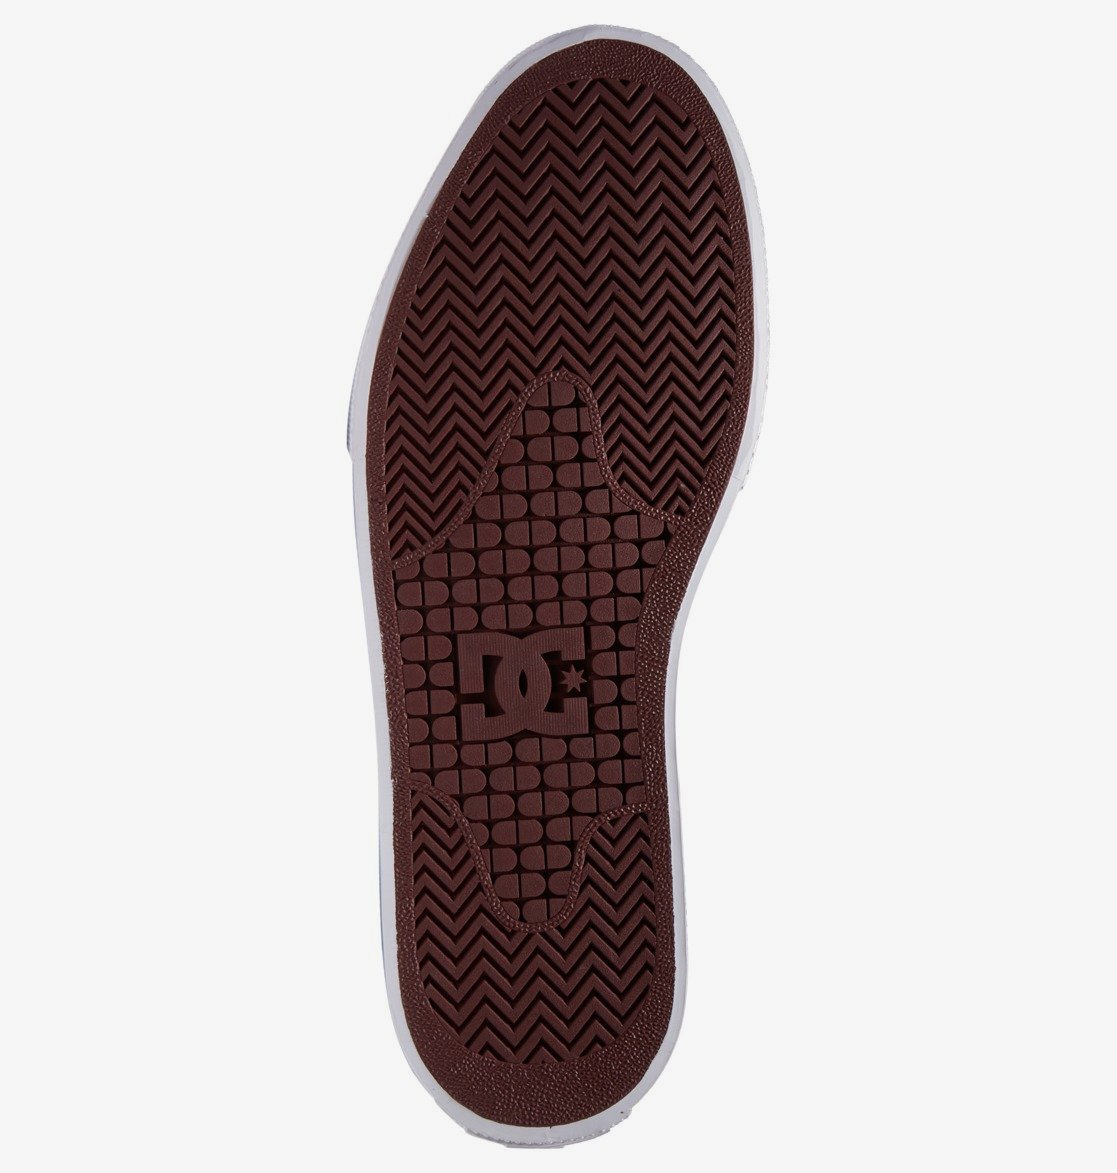 dcshoes, Manual S - Leather Skate Shoes for Men, BURGUNDY (bur)